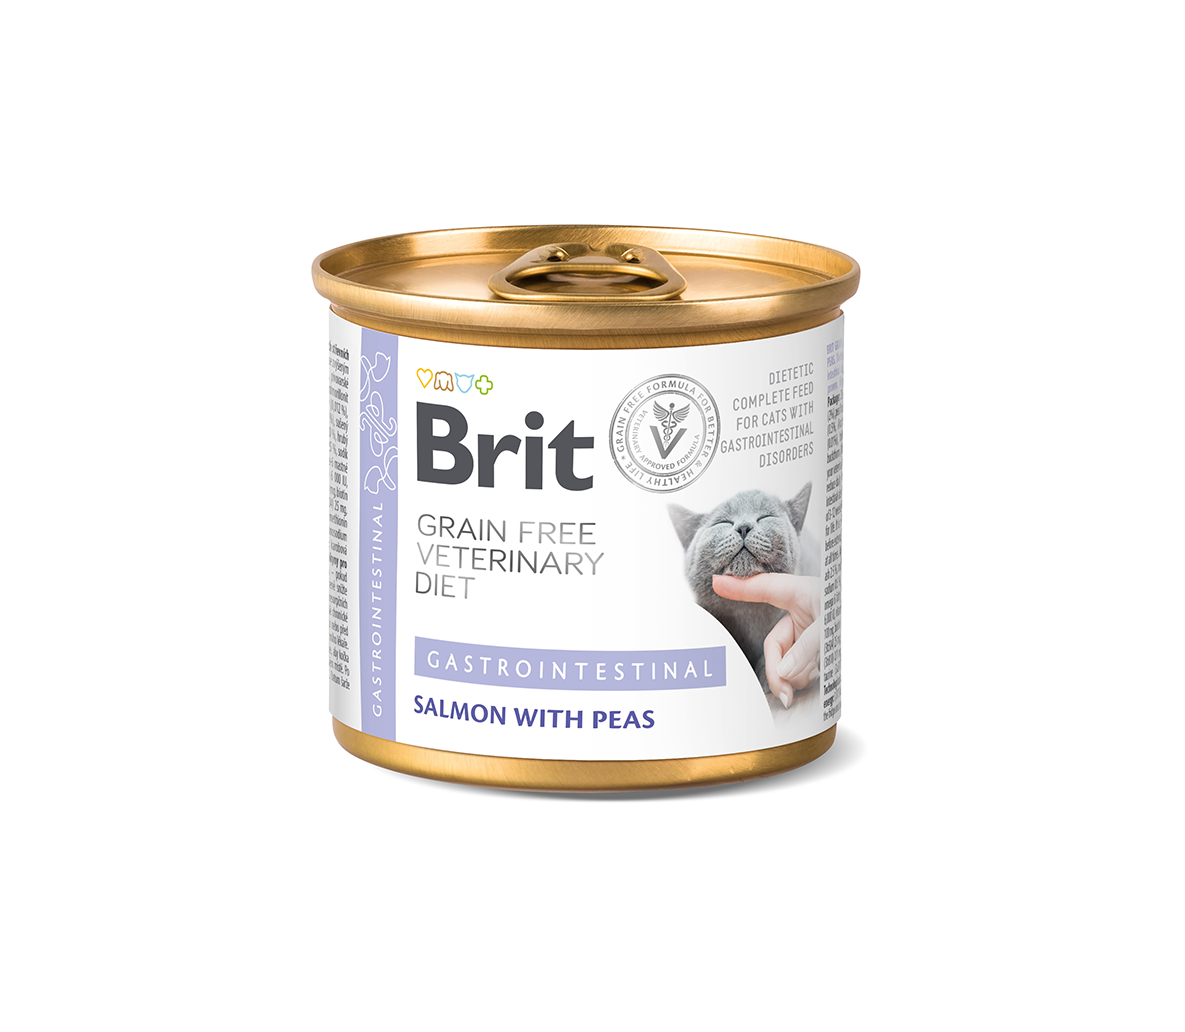 Brit GF Veterinary Diets kons. katėms Gastrointestinal 200g